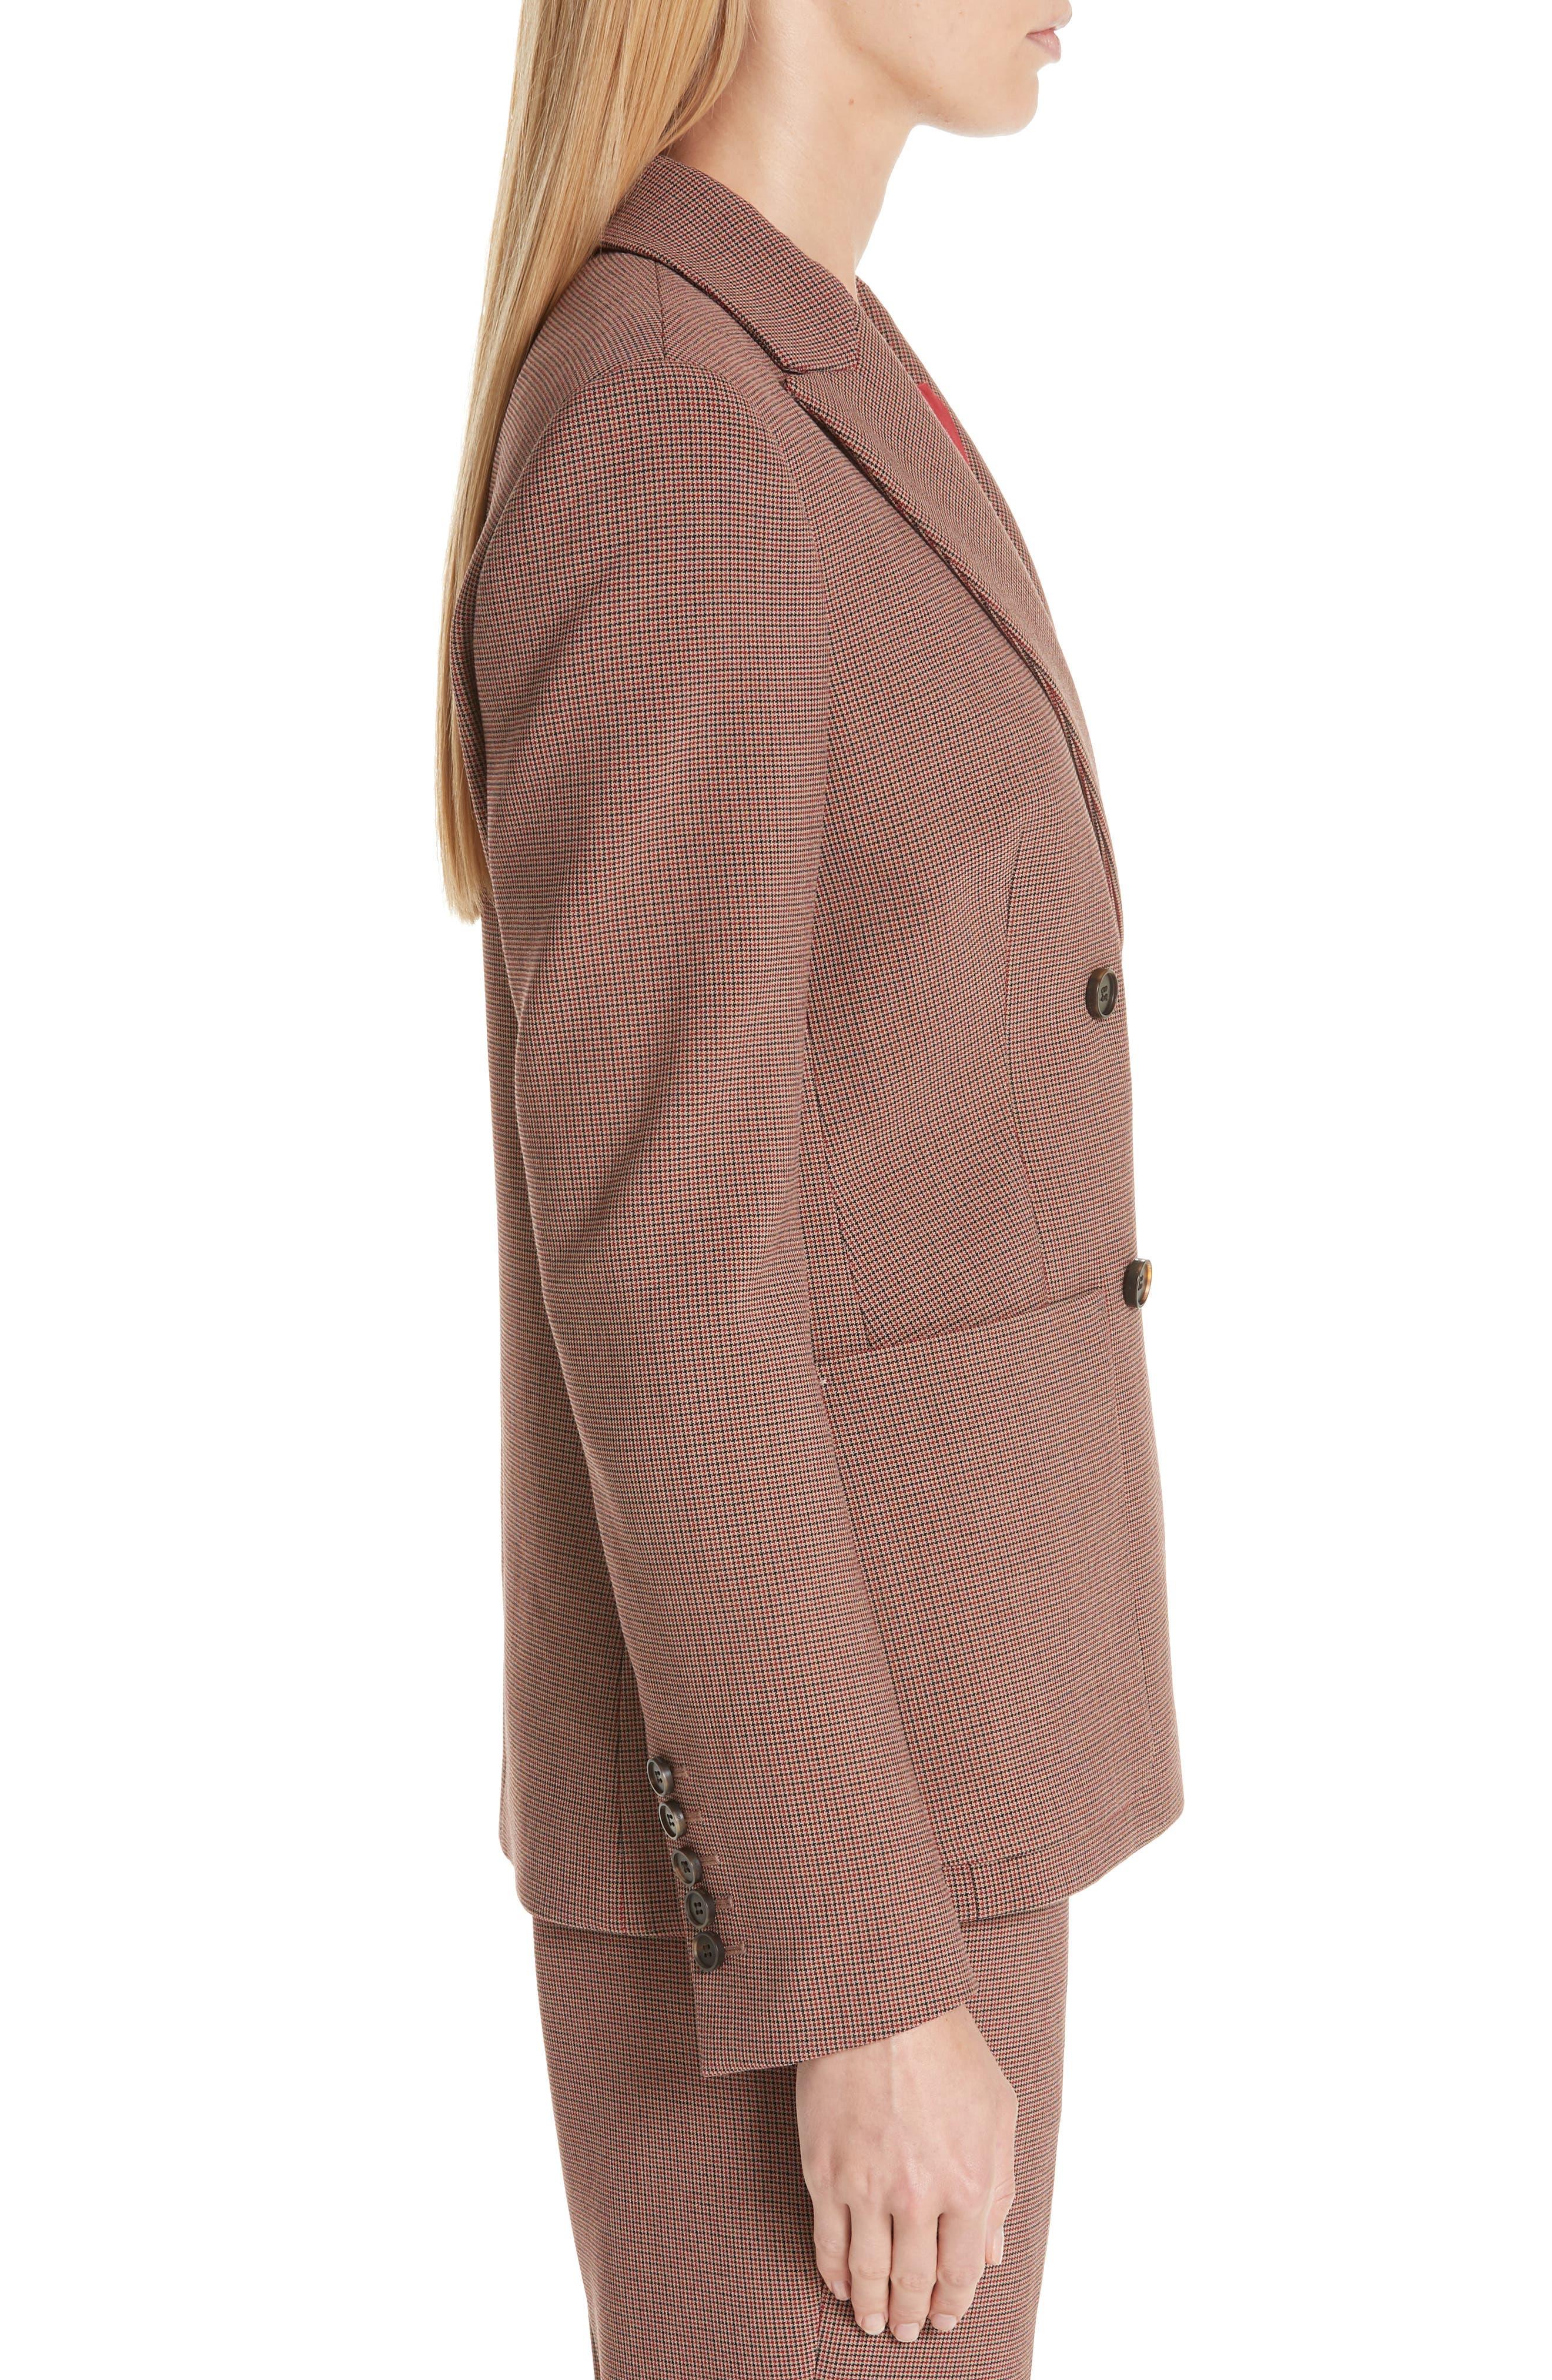 Joliviena Check Suit Jacket,                             Alternate thumbnail 3, color,                             DARK RED CHECK